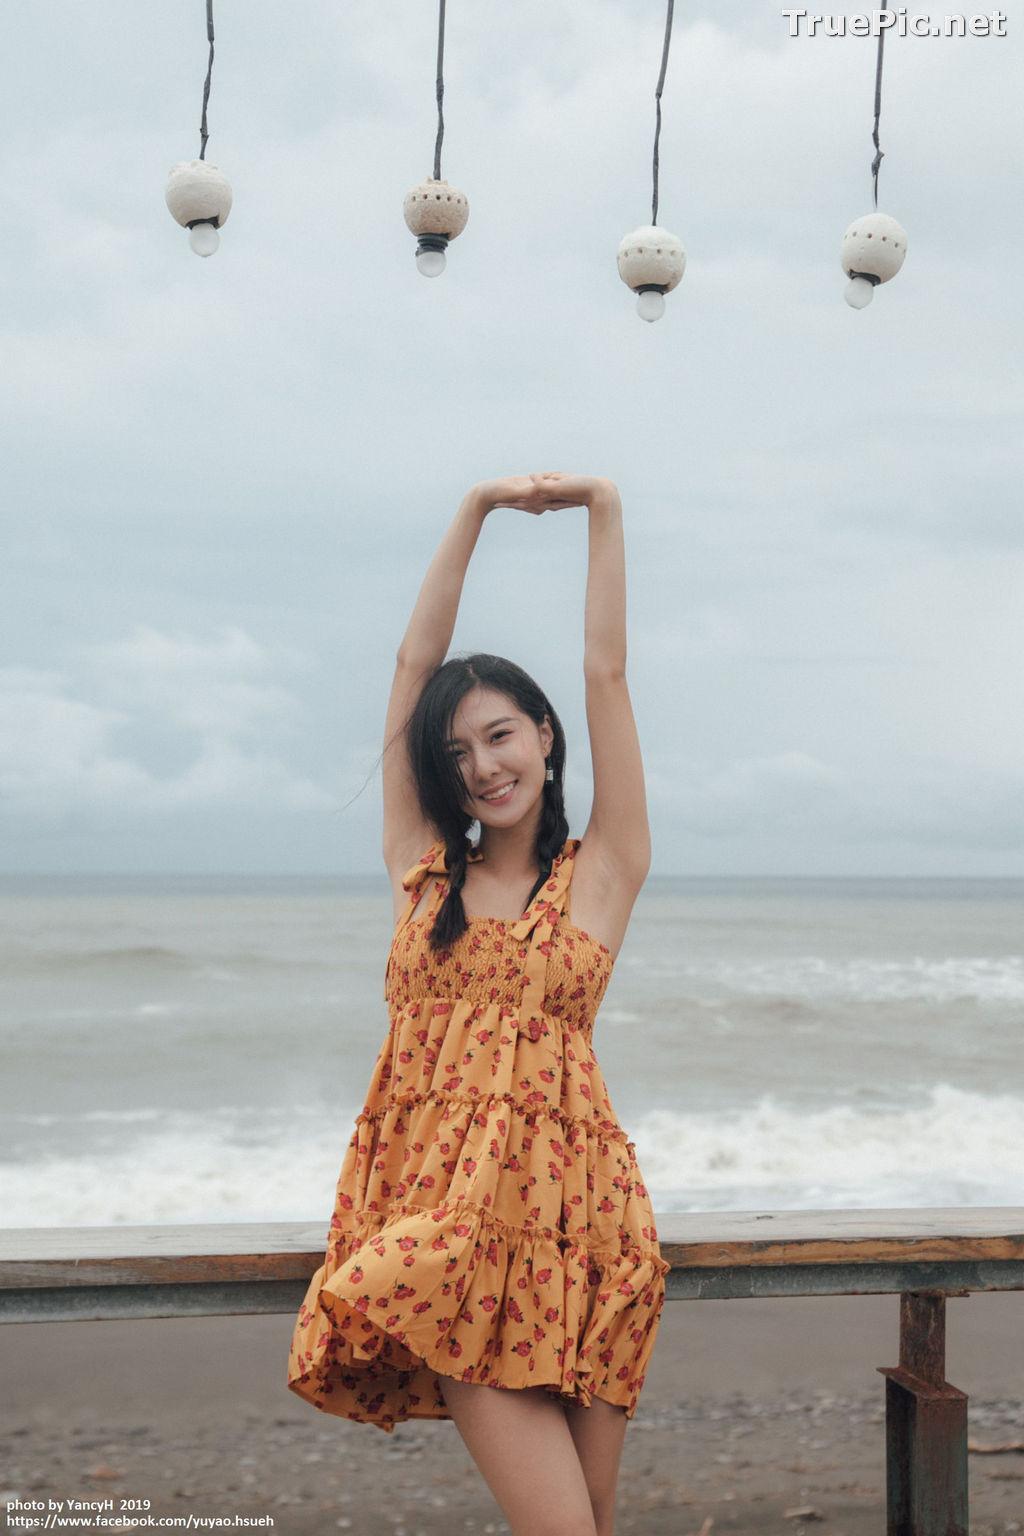 Image Taiwanese Model - 郁晴 - Welcome Summer with Beautiful Bikini Girls - TruePic.net - Picture-5